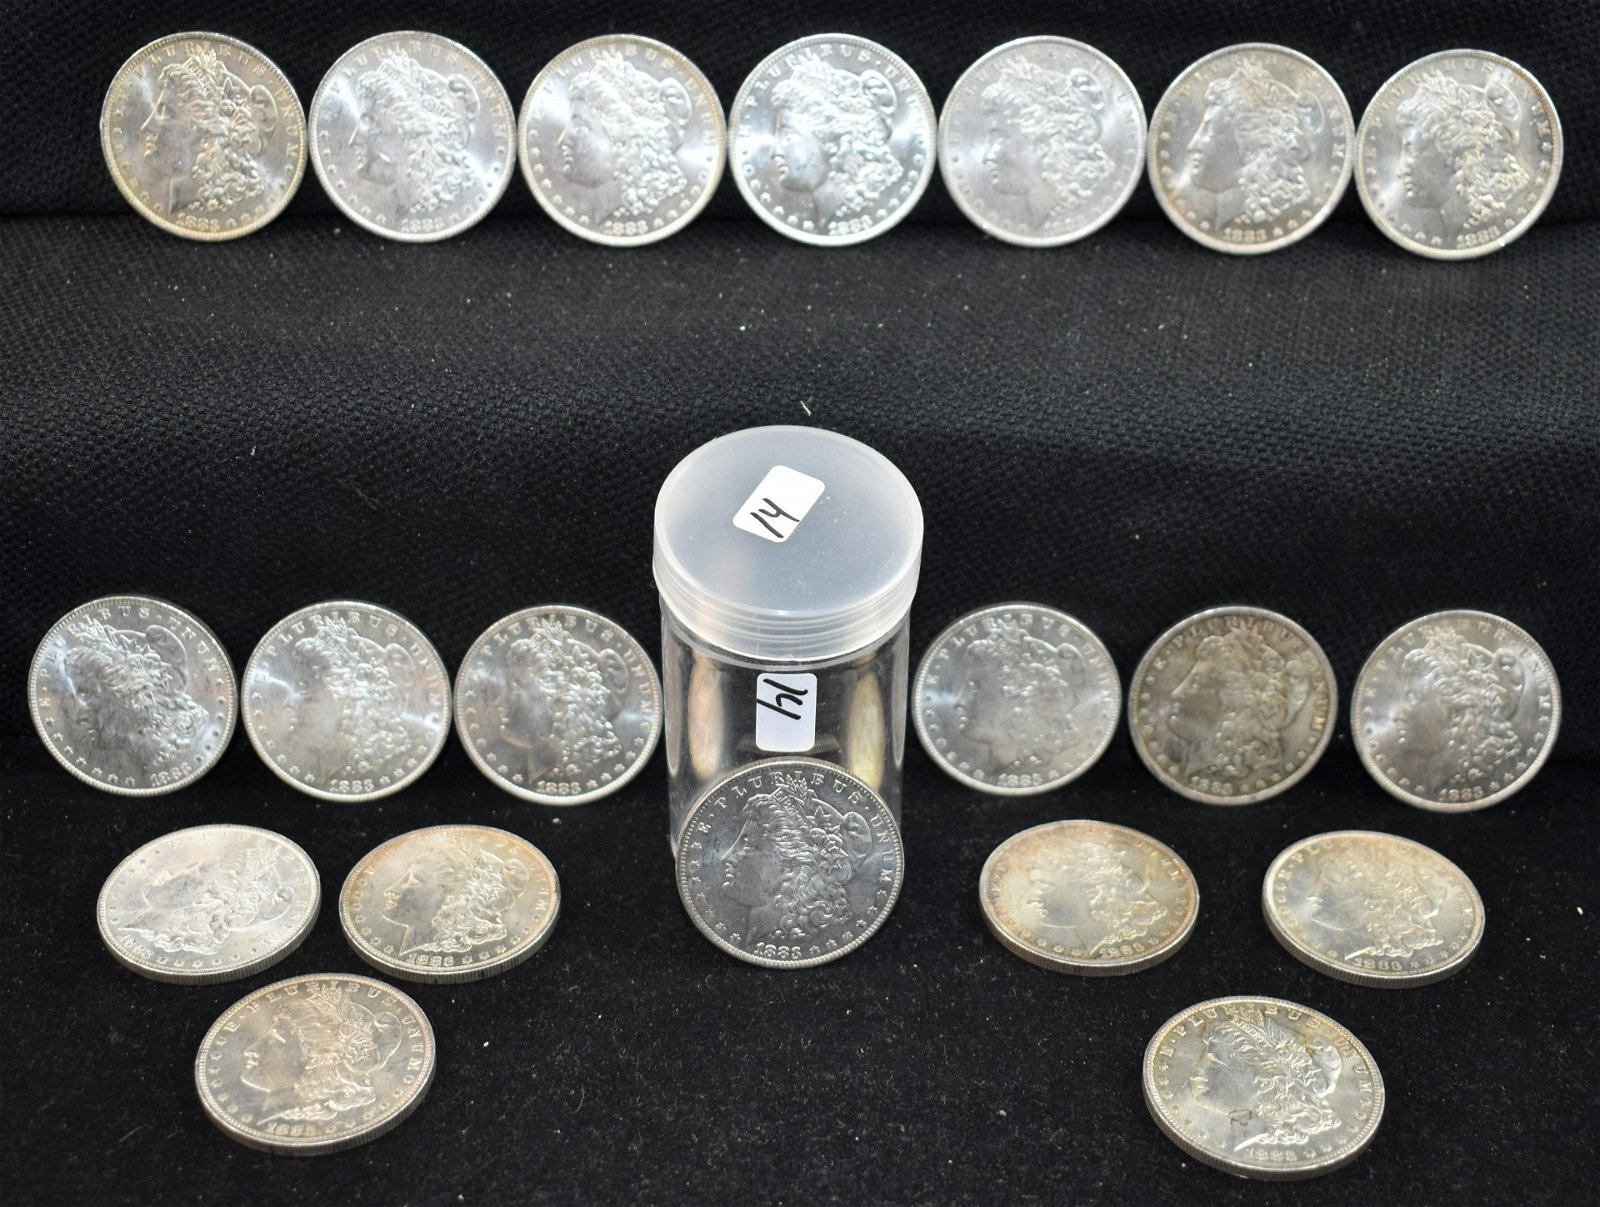 20 BU 1883-0 MORGAN DOLLARS FROM SAFE DEPOSIT